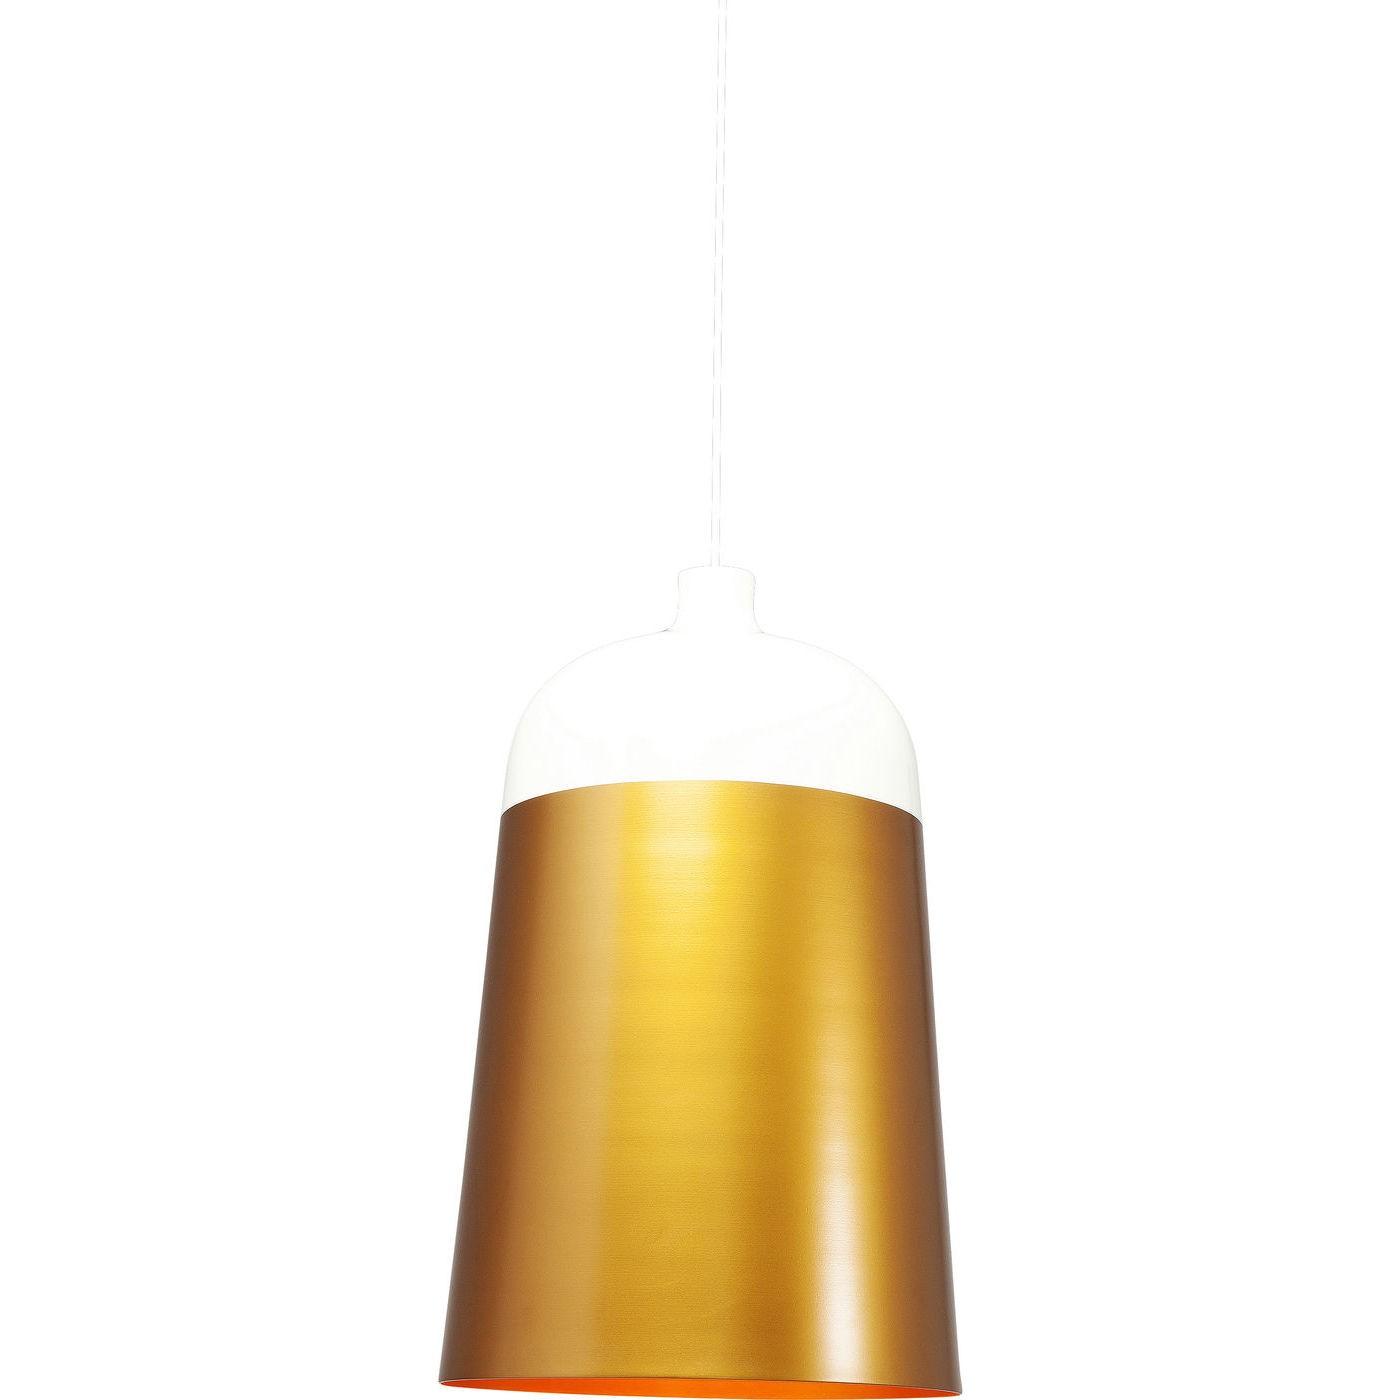 Loftslampe la olla ø33 cm fra kare design fra boboonline.dk